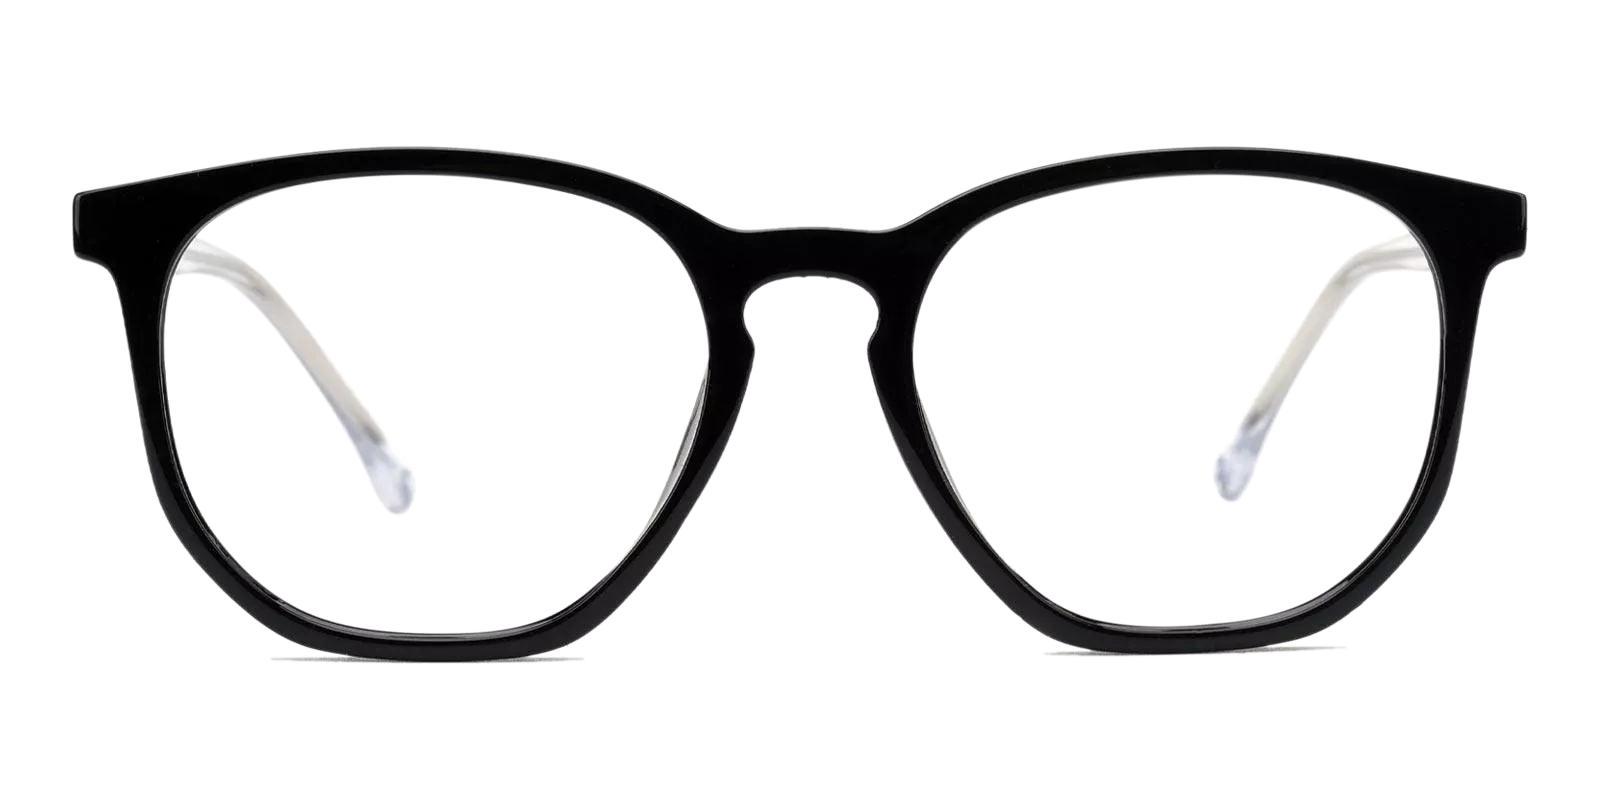 Russell Black TR Eyeglasses , Fashion , UniversalBridgeFit Frames from ABBE Glasses